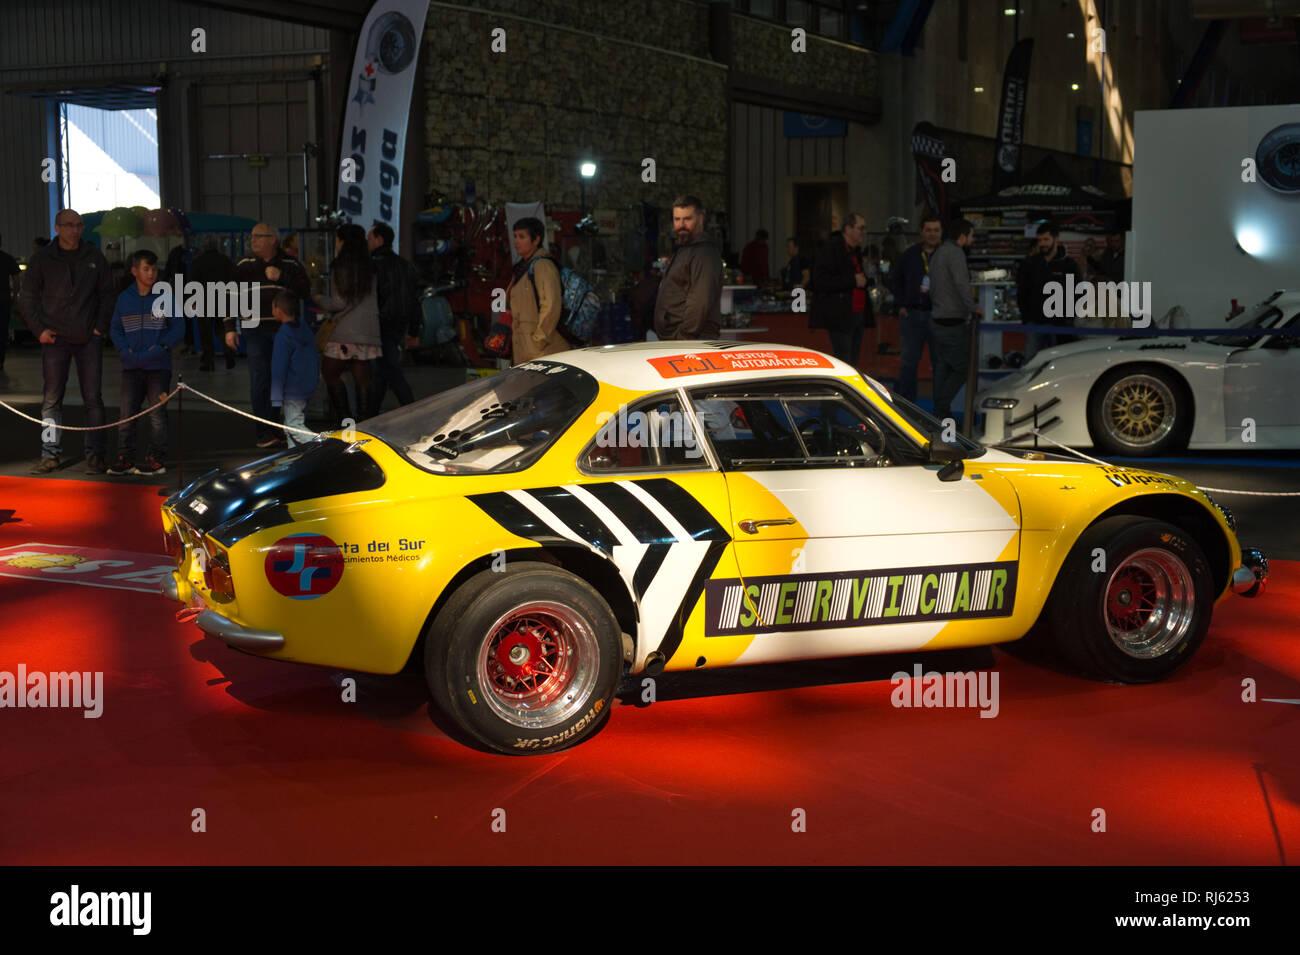 Renault Alpine A110. Retro Málaga 2019. Spain. Stock Photo